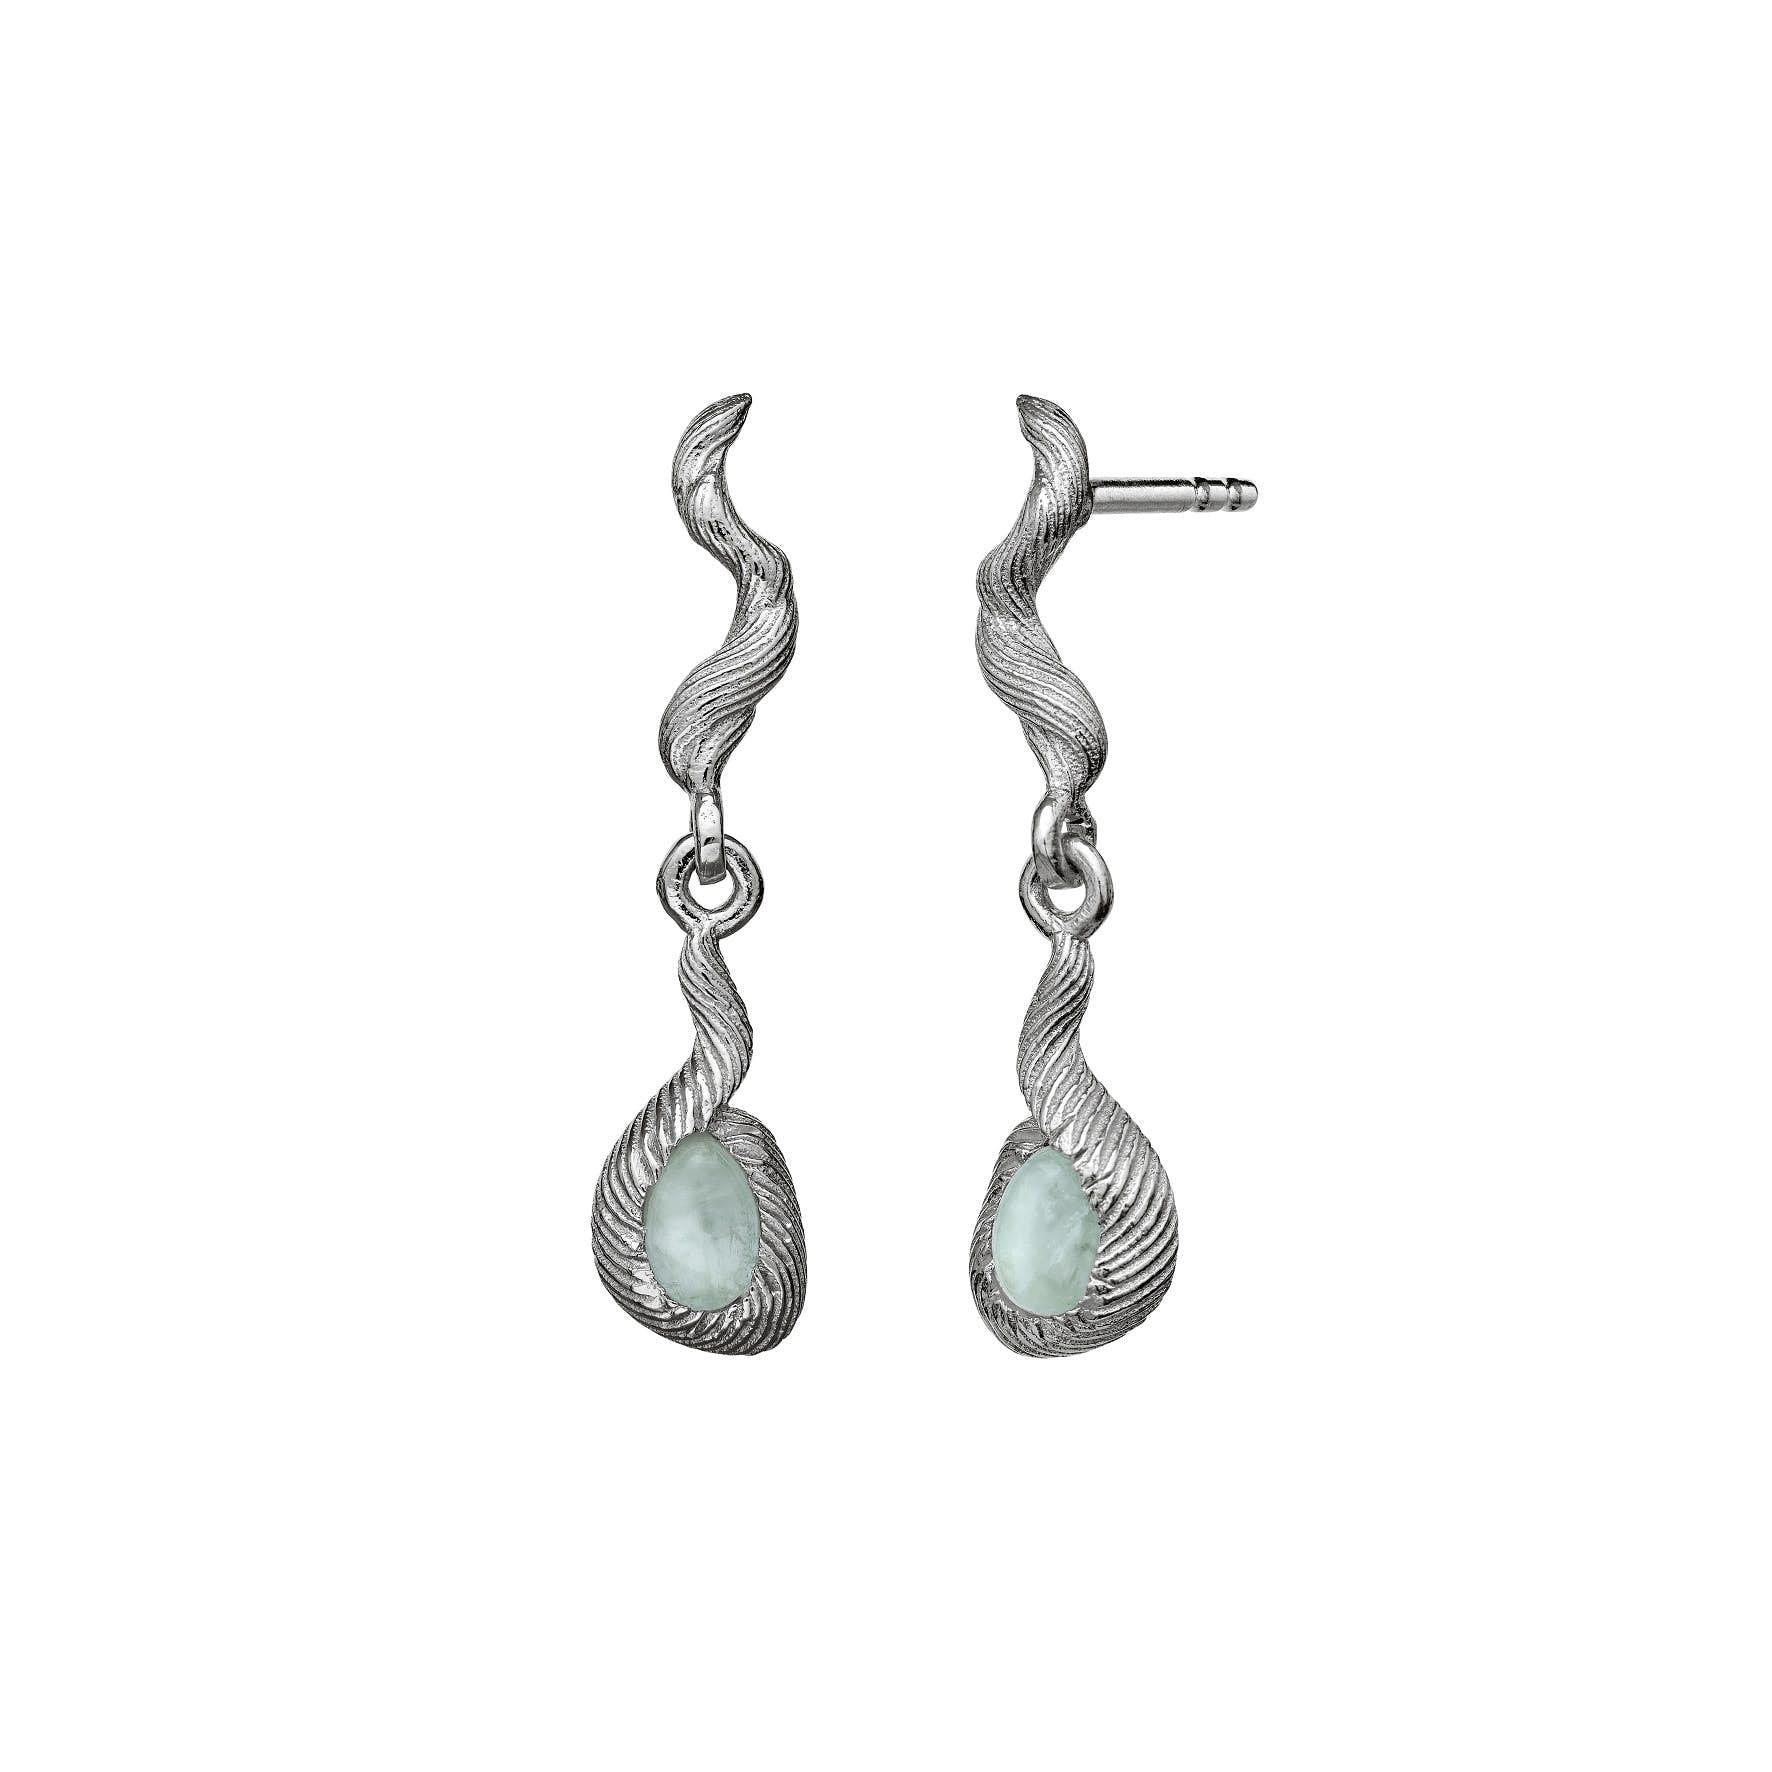 Nico Earrings von Maanesten in Silber Sterling 925